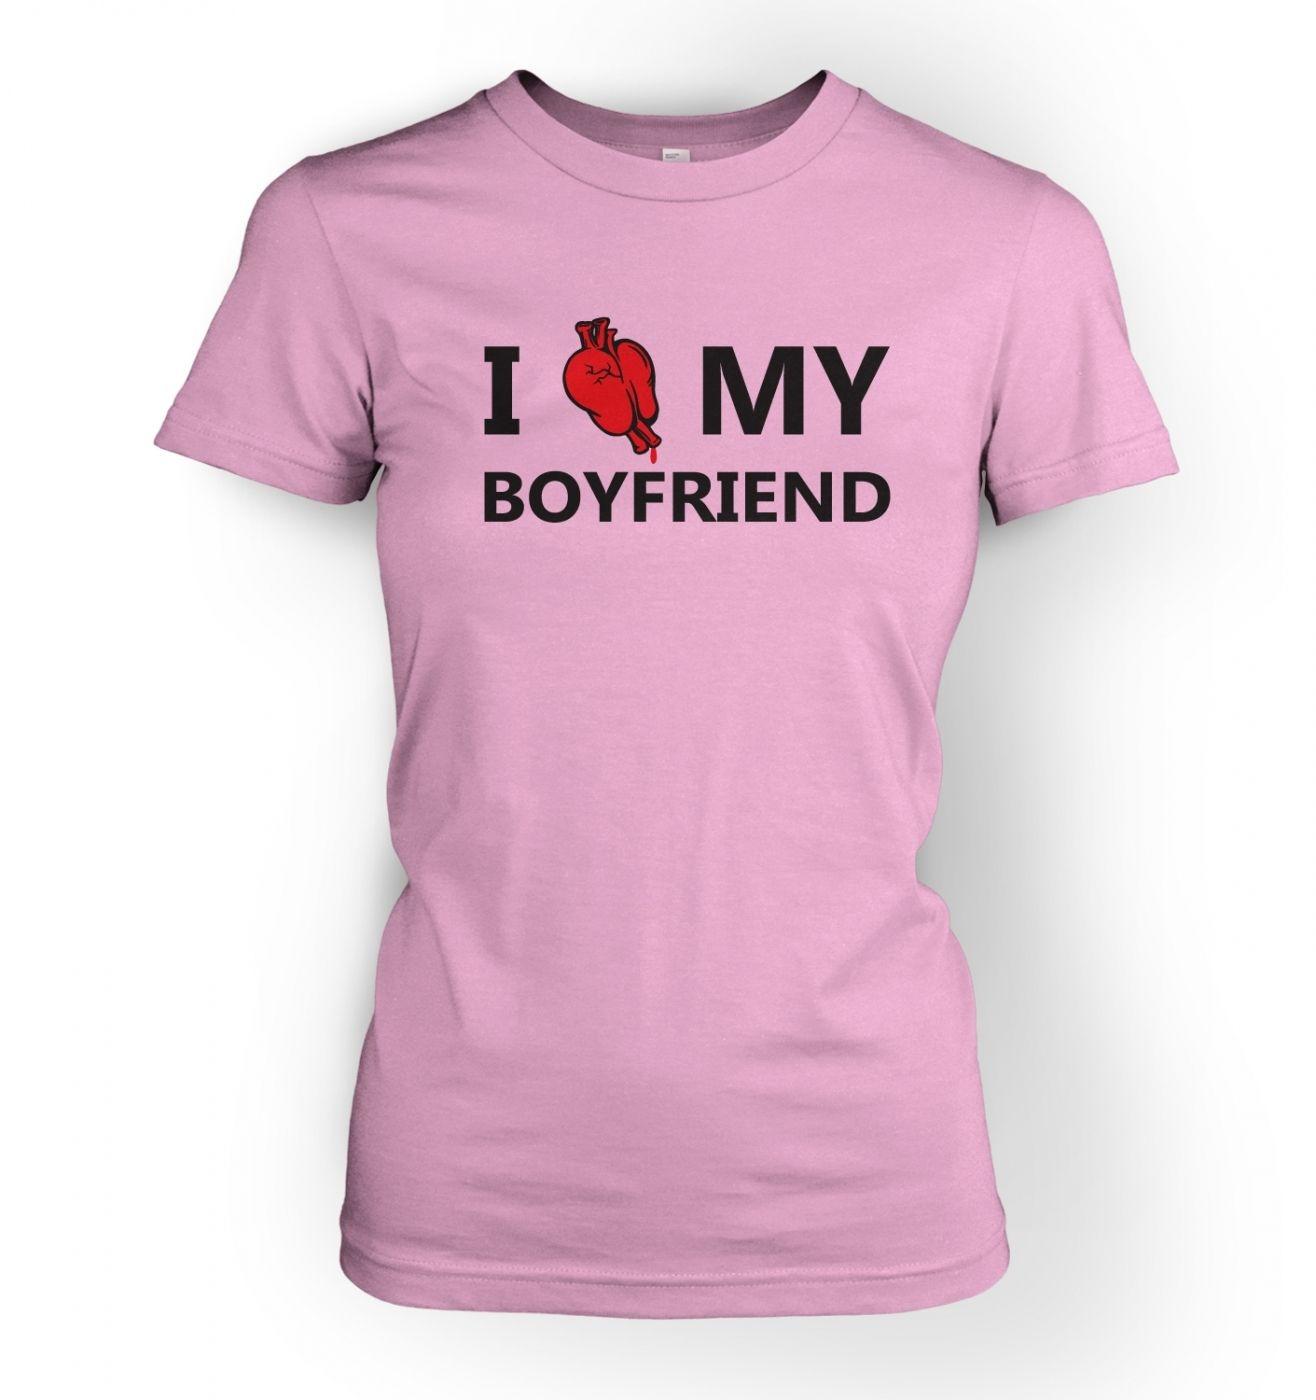 Women's I real heart my boyfriend t-shirt